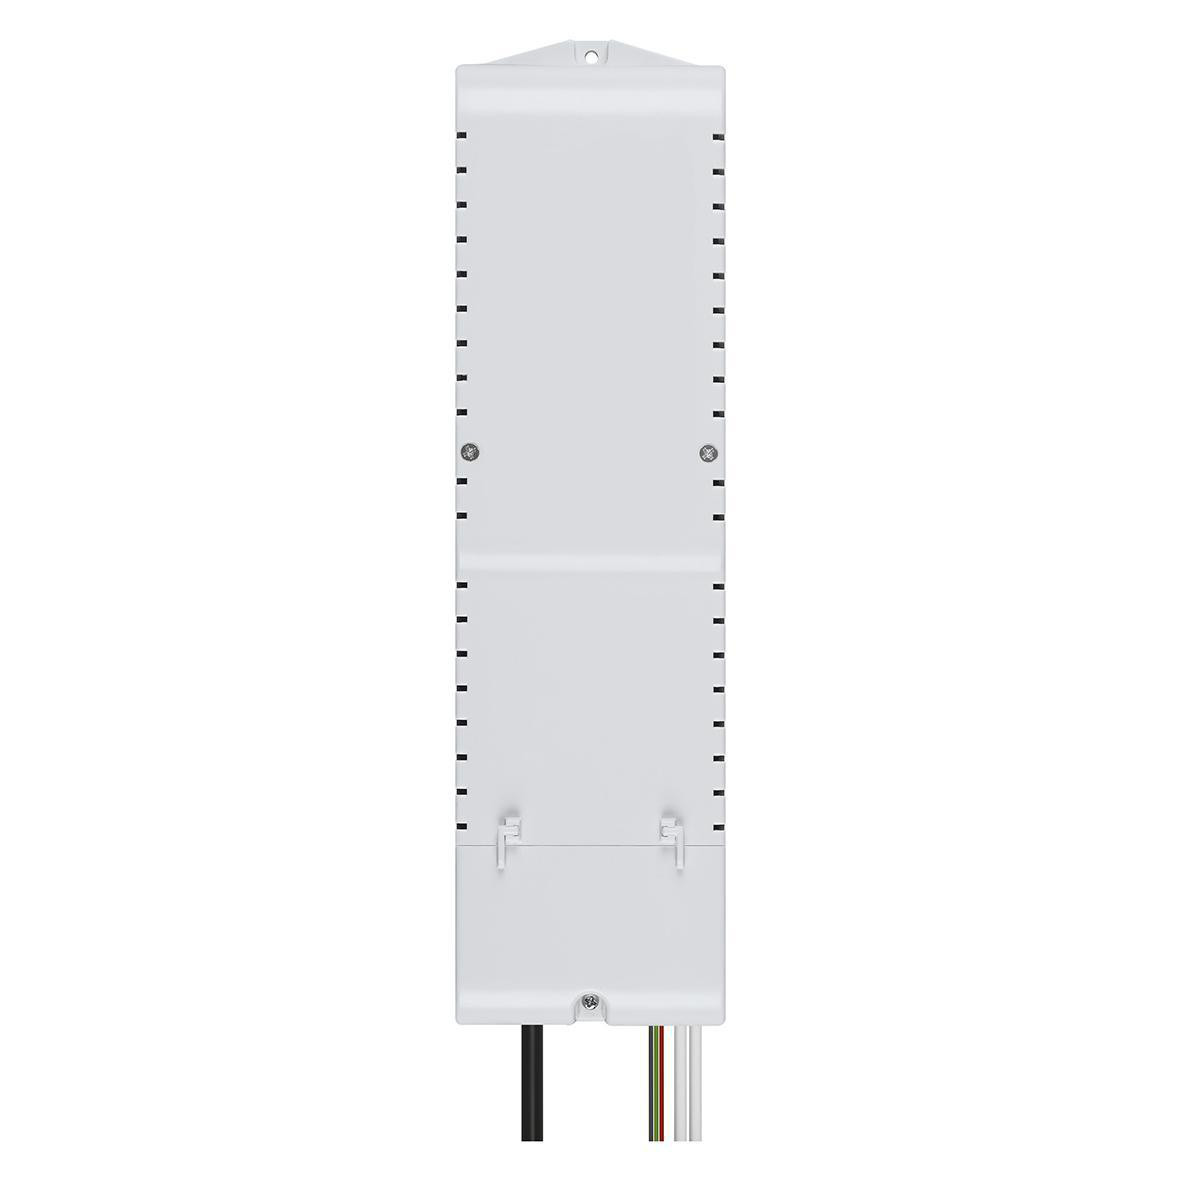 LEDVANCE Emergency batteripakke - Paneler, downlights